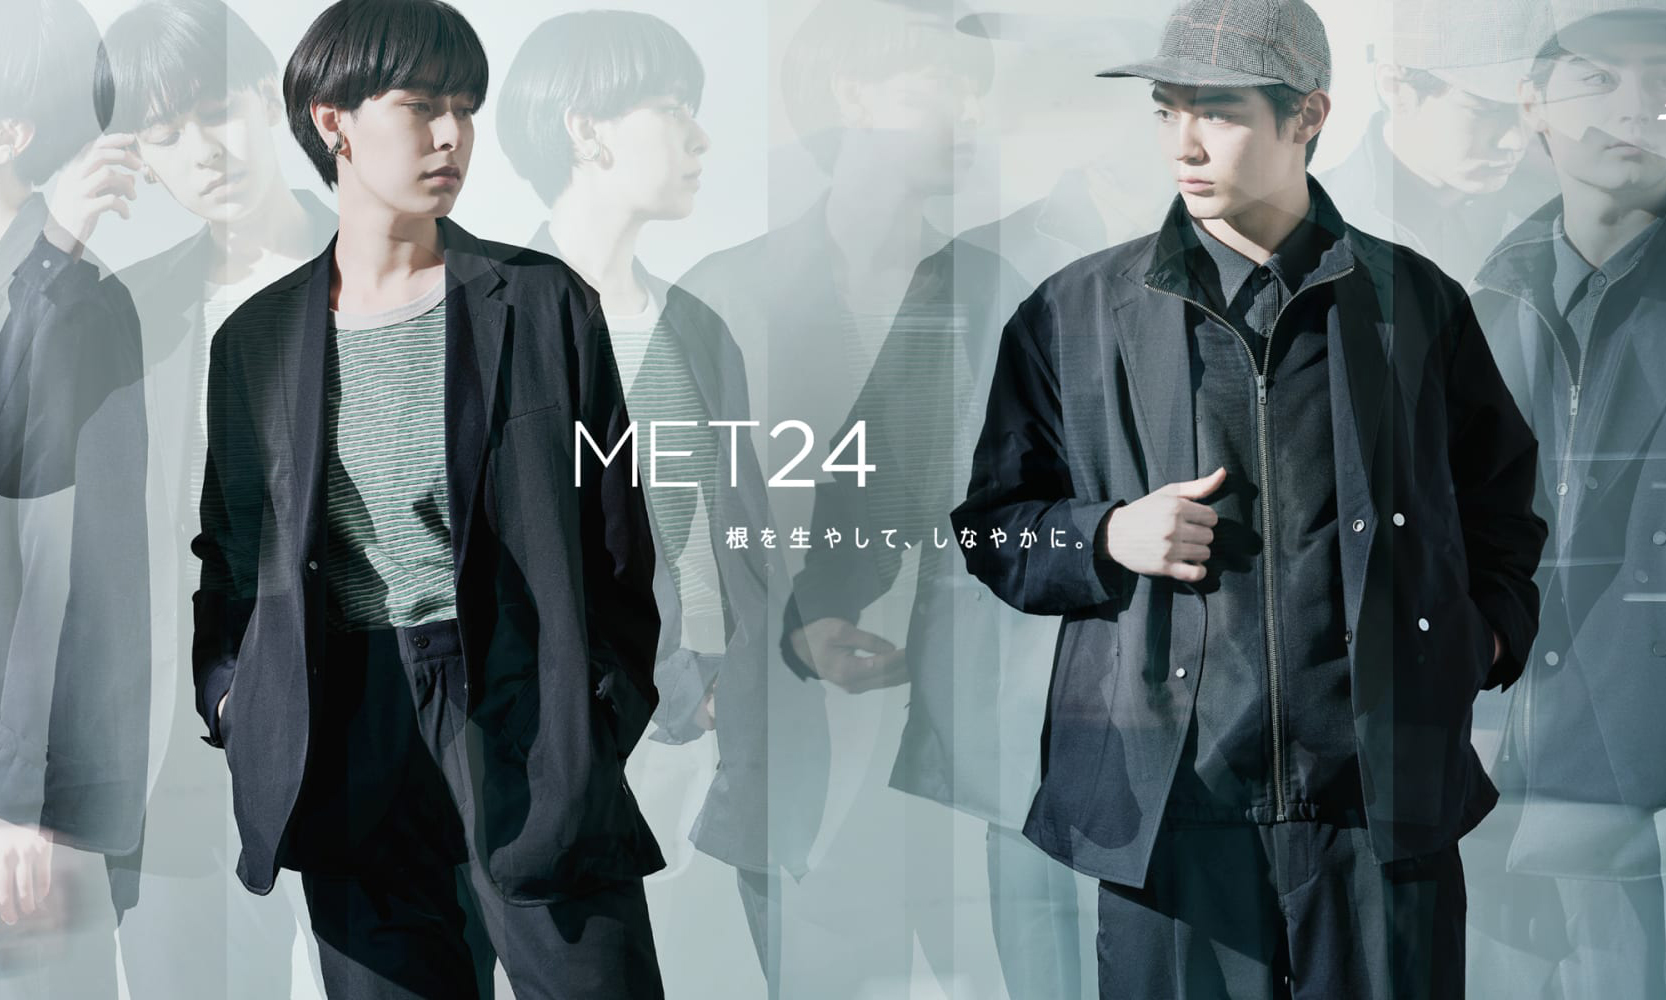 New Balance 打造全新「MET24」服装支线